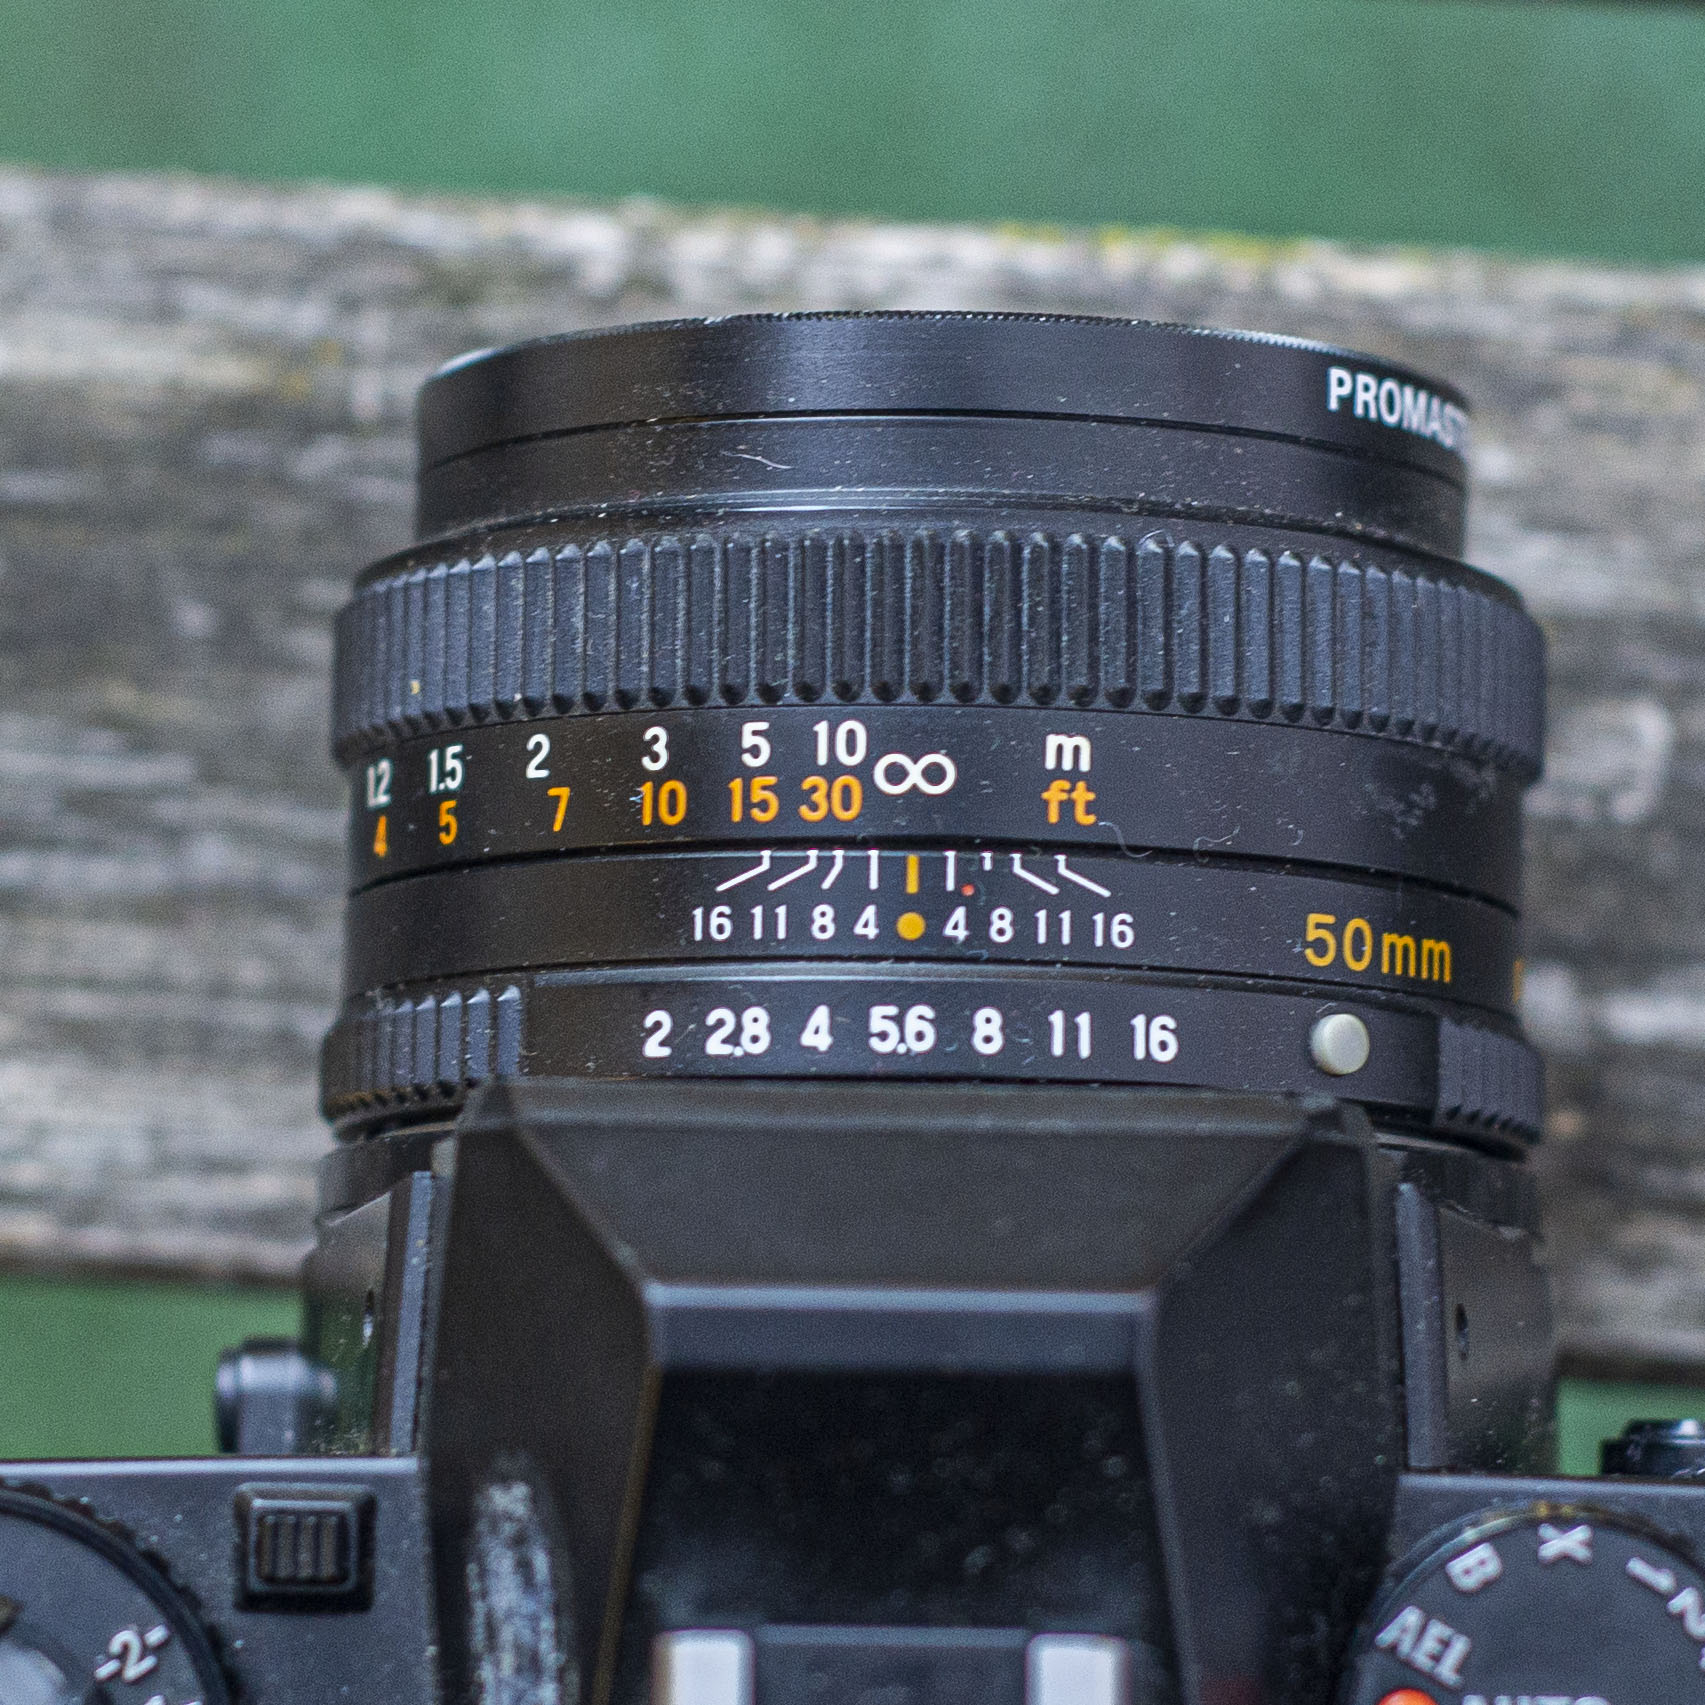 Mamiya ZE-2 lens detail